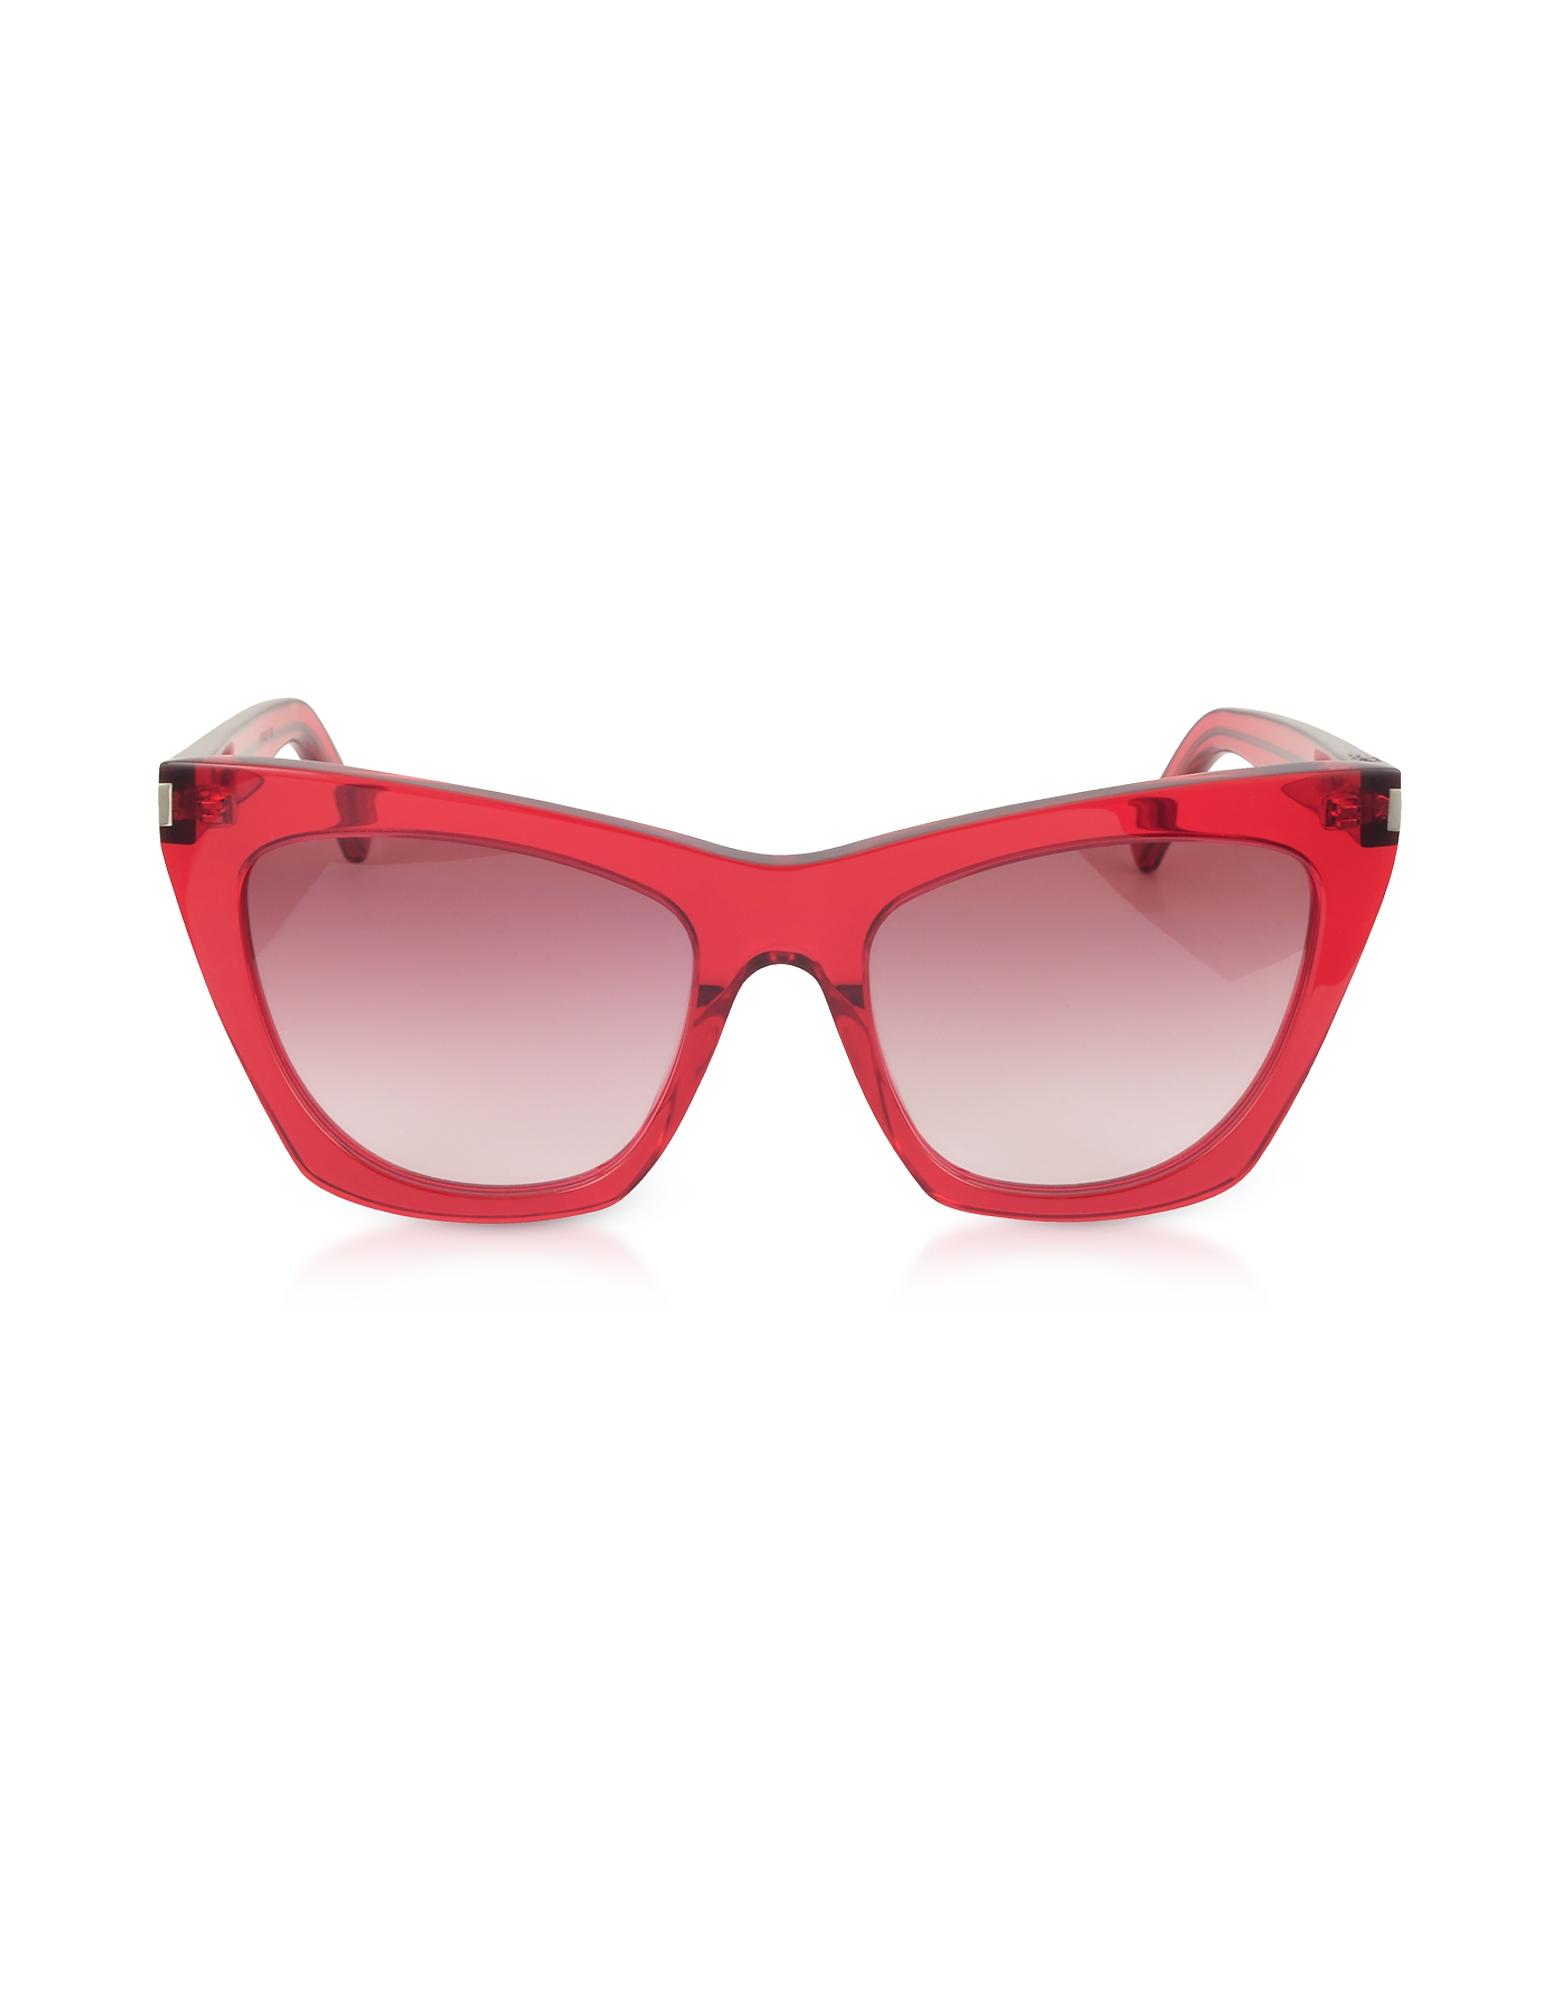 Saint Laurent Designer Sunglasses, New Wave 214 KATE Acetate Sunglasses